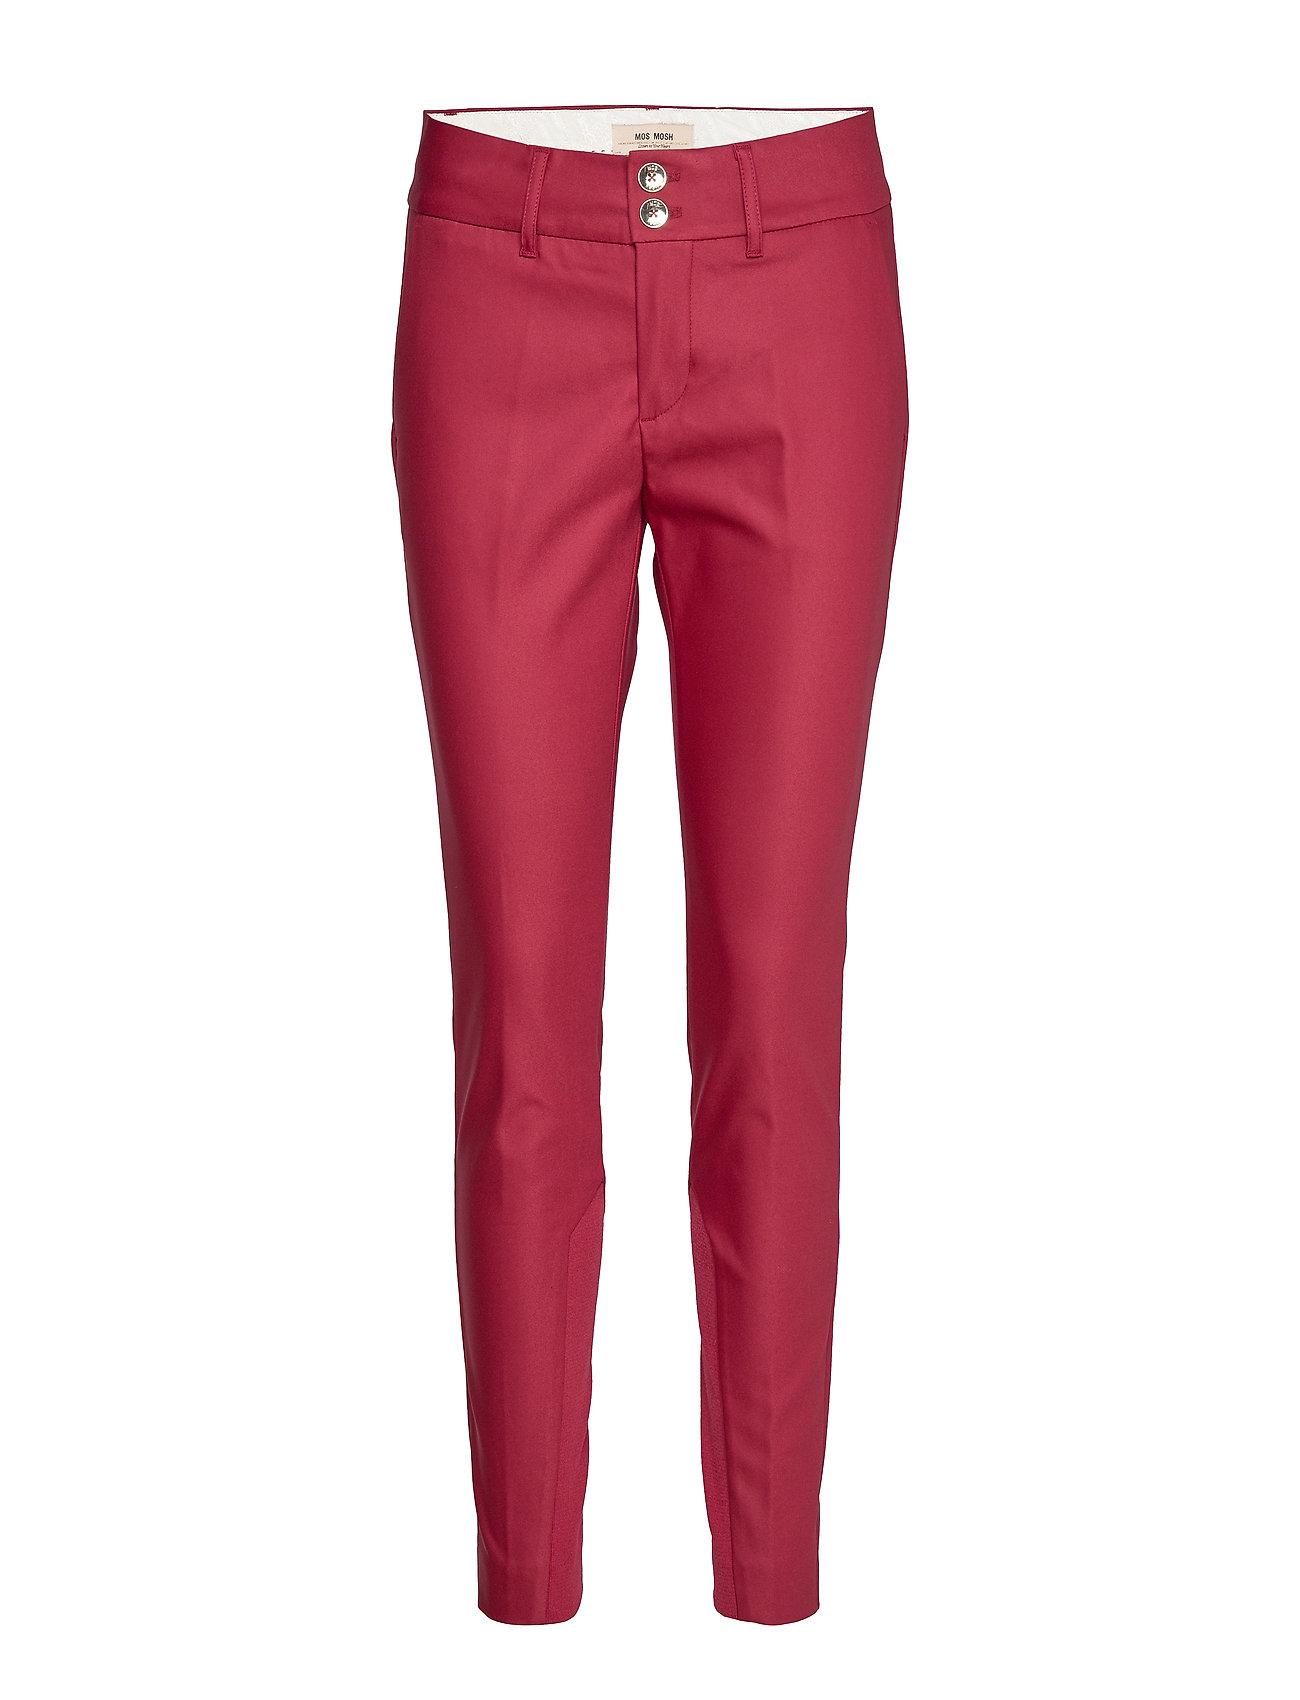 MOS MOSH Blake Night Pant Sustainable - COURAGE RED